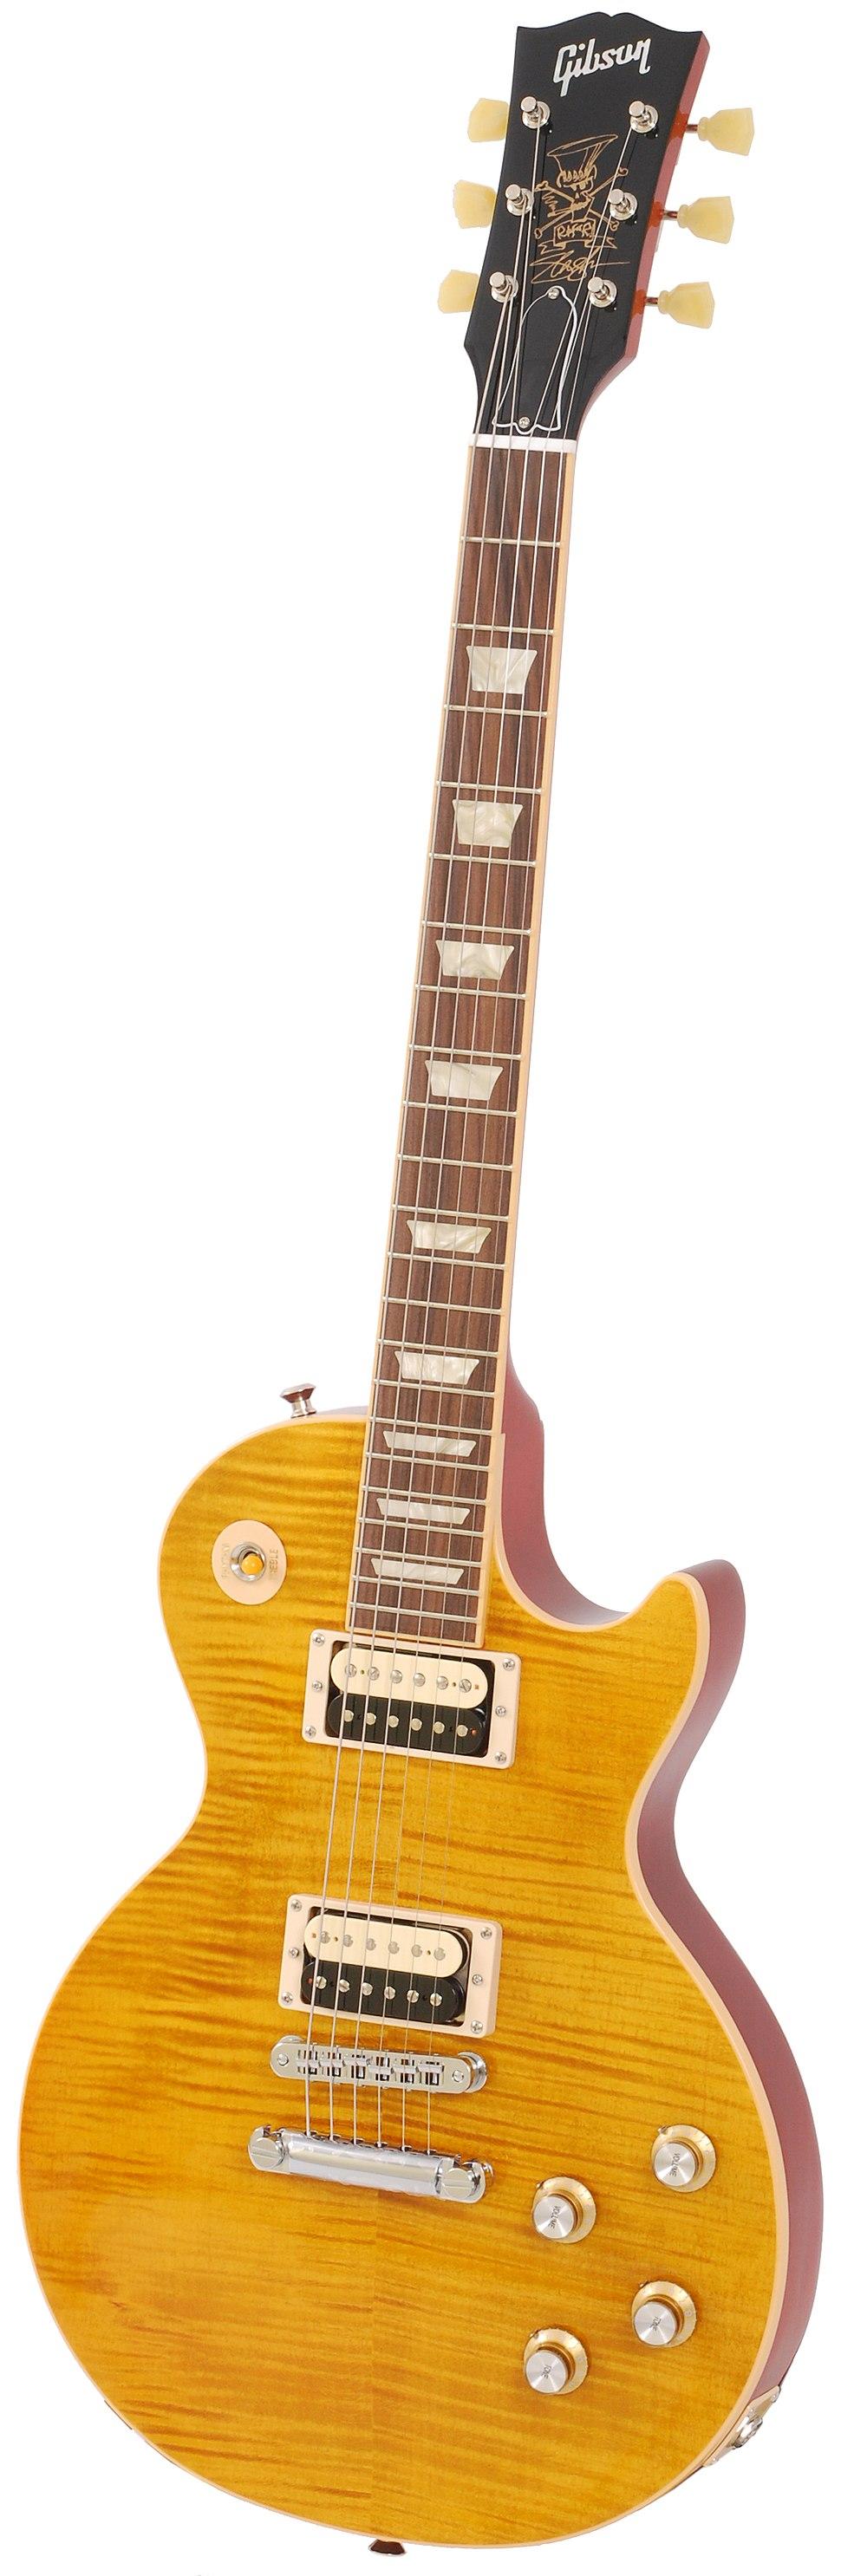 "Gitara elektryczna Les Paul Slash ""Apetite For Destruction"" firmy Gibson"